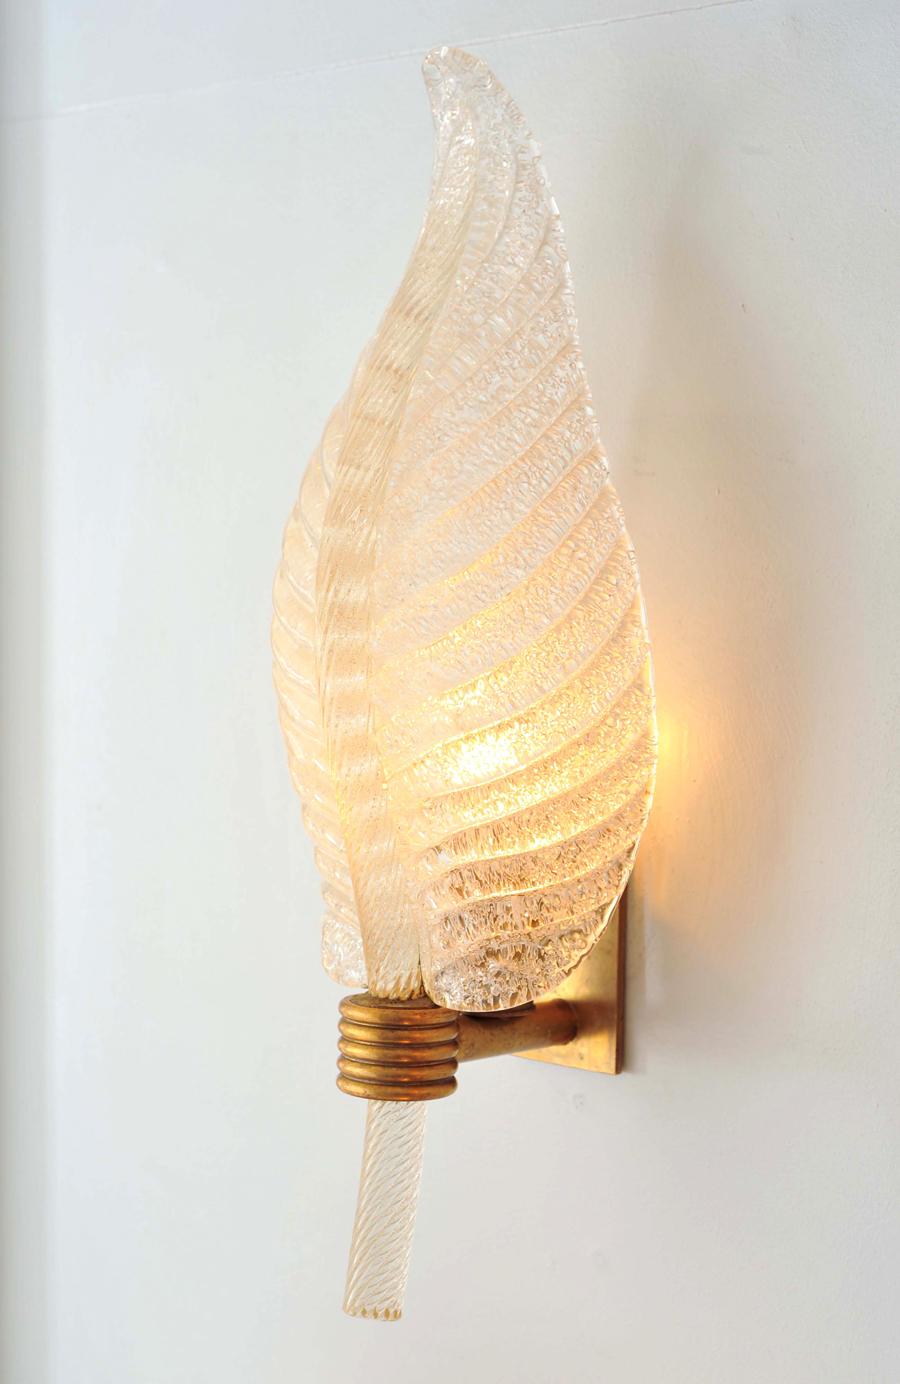 Valerie Wade Lw608 Pair 1950S Italian Leaf Wall Lights 03